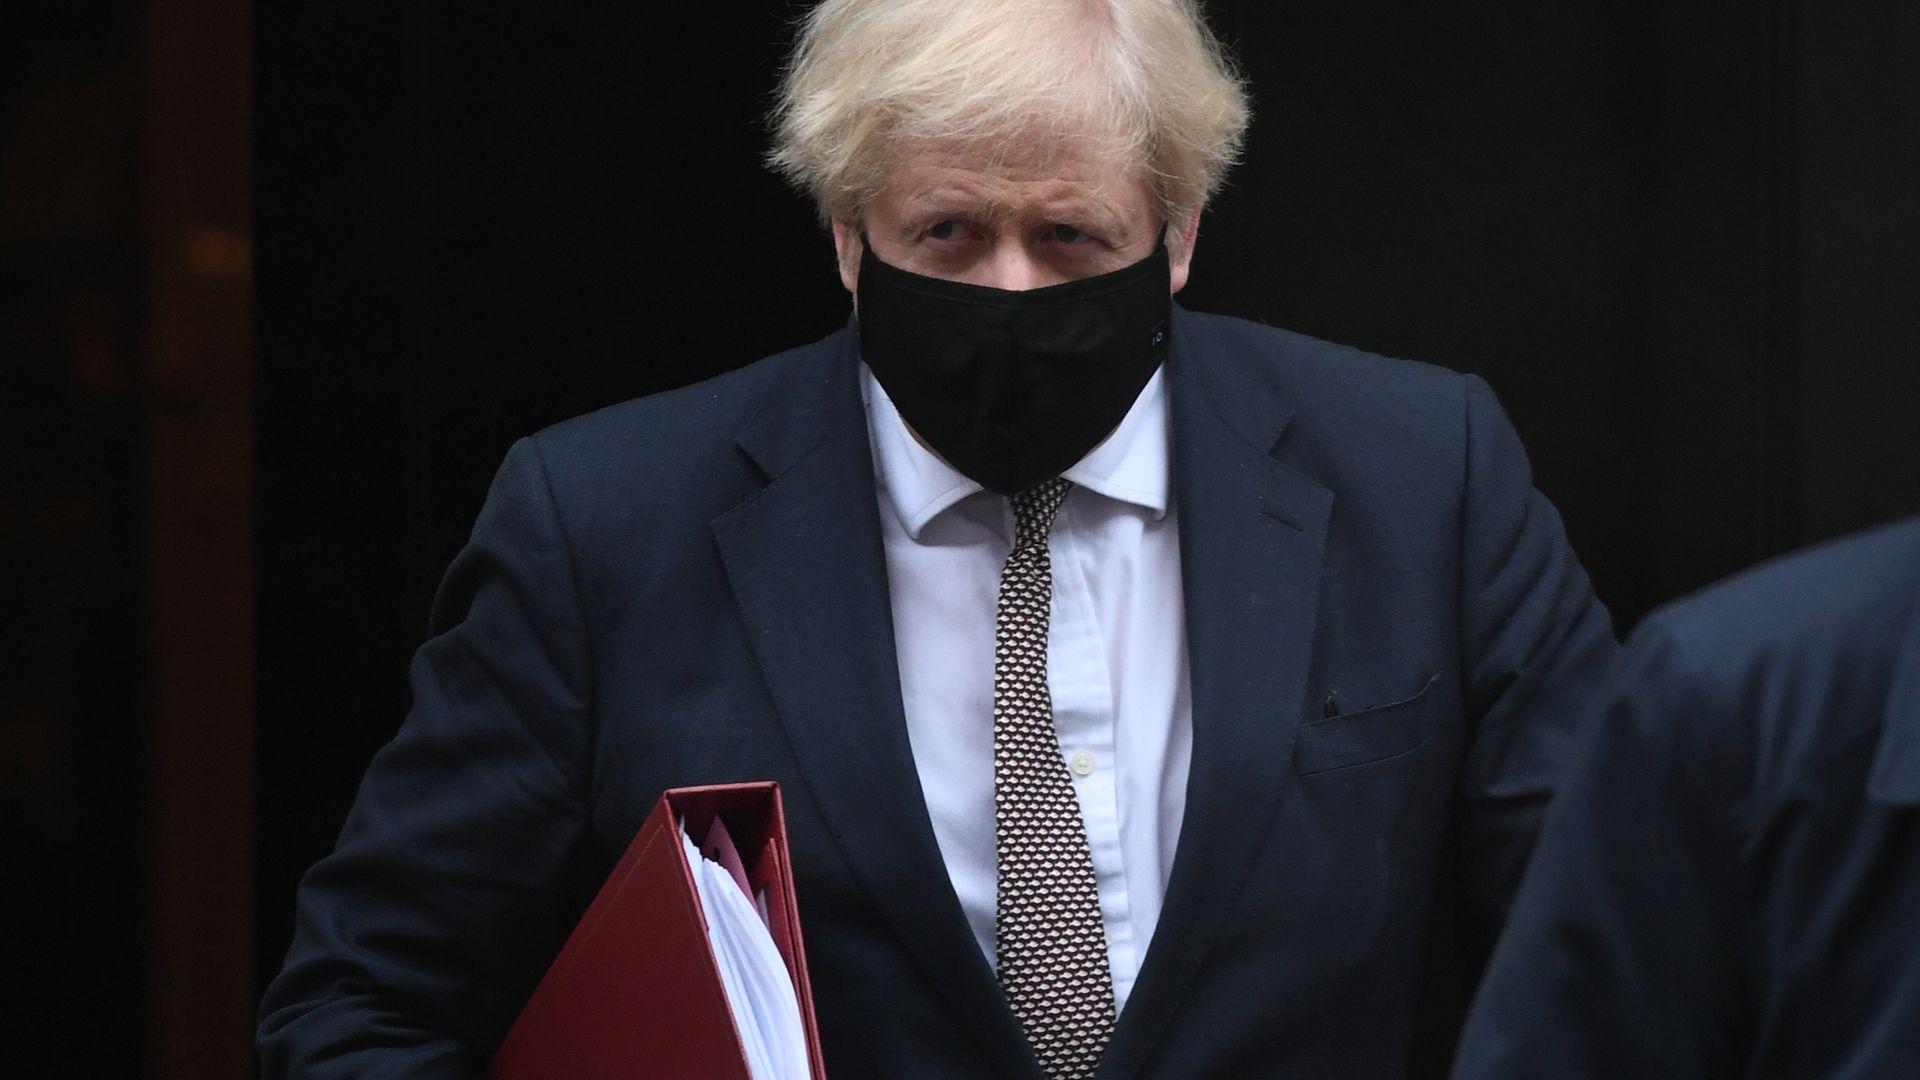 Prime minister Boris Johnson leaves 10 Downing Street - Credit: PA